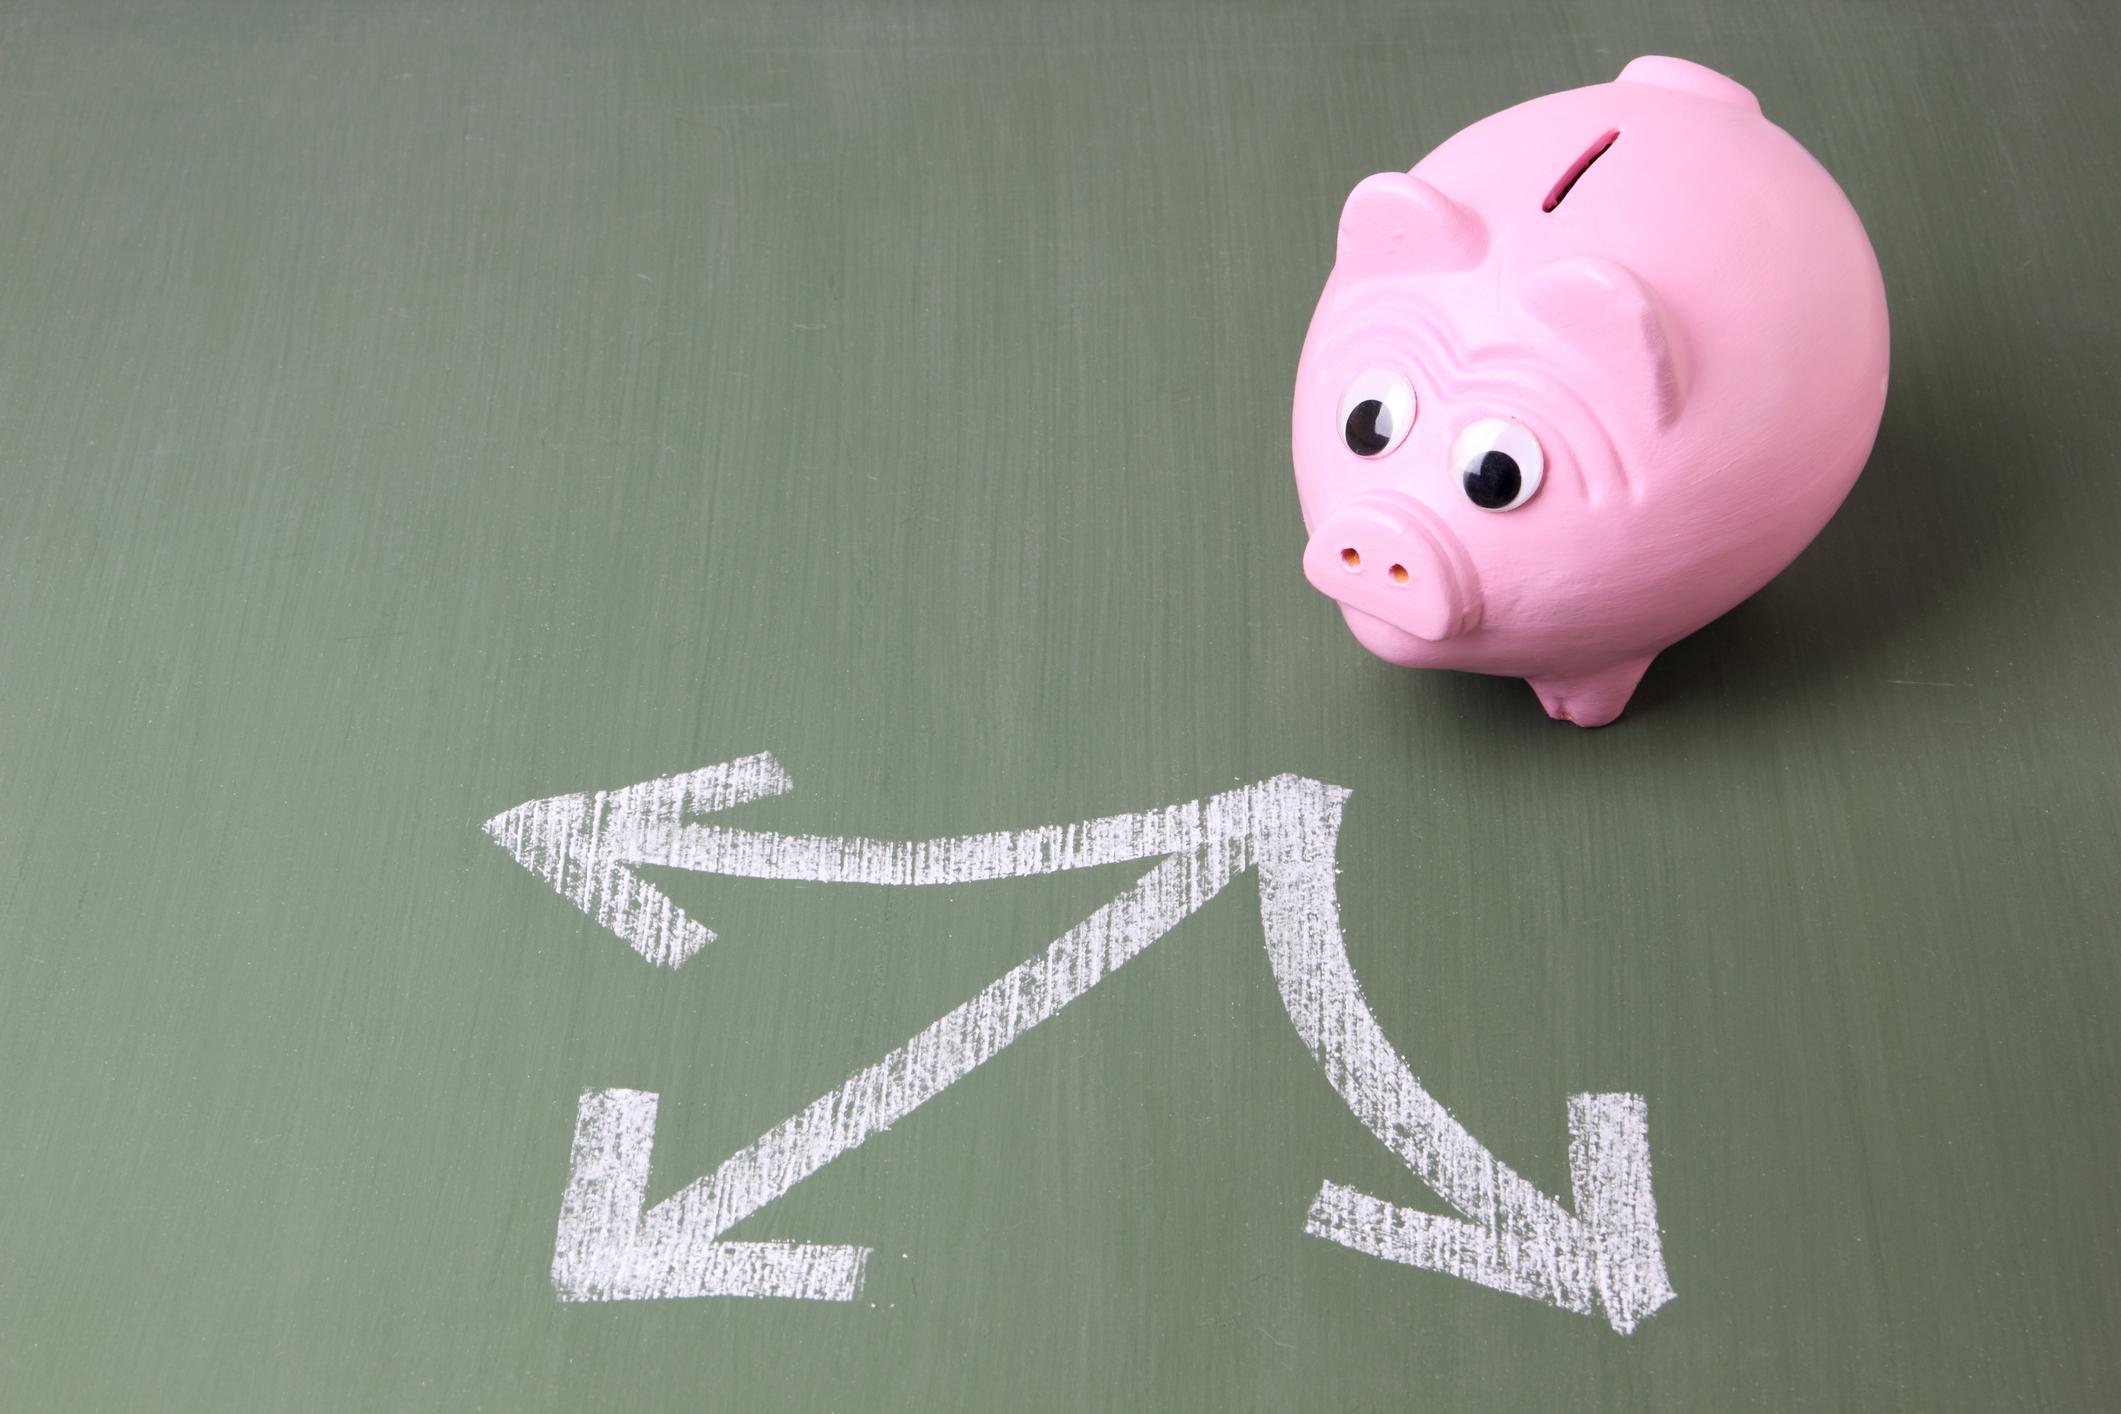 Tipos de risco de investimento no Empreendedorismo